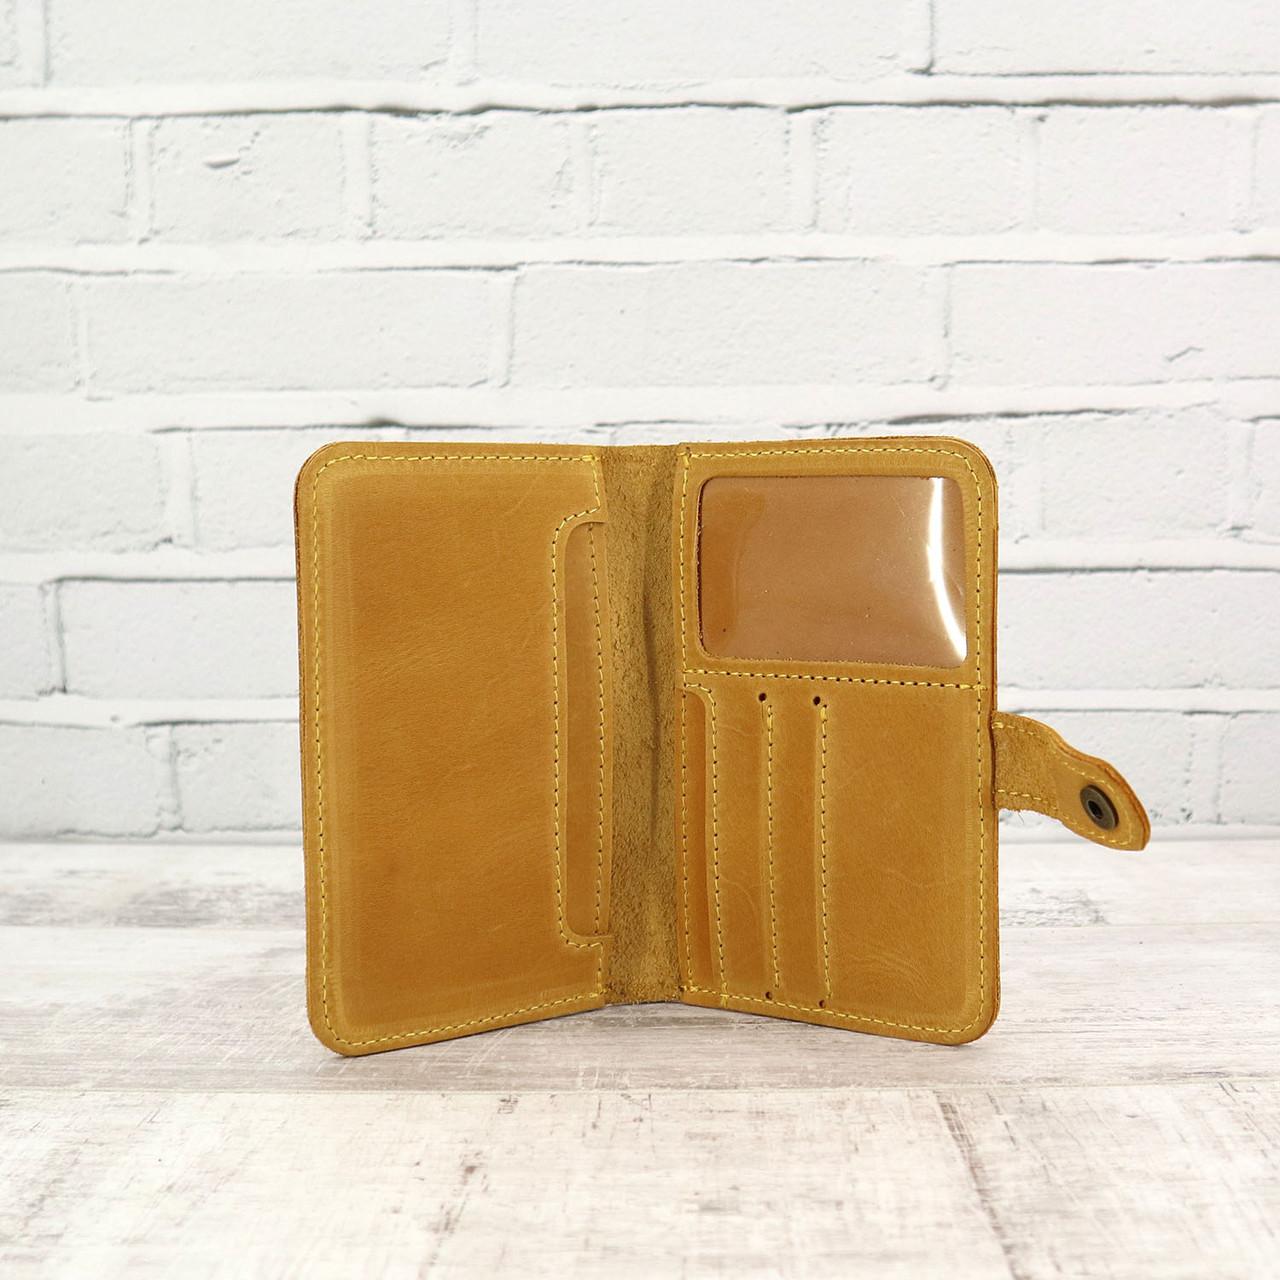 Кошелек Mihey window жёлтый из натуральной кожи crazy horse 1230208